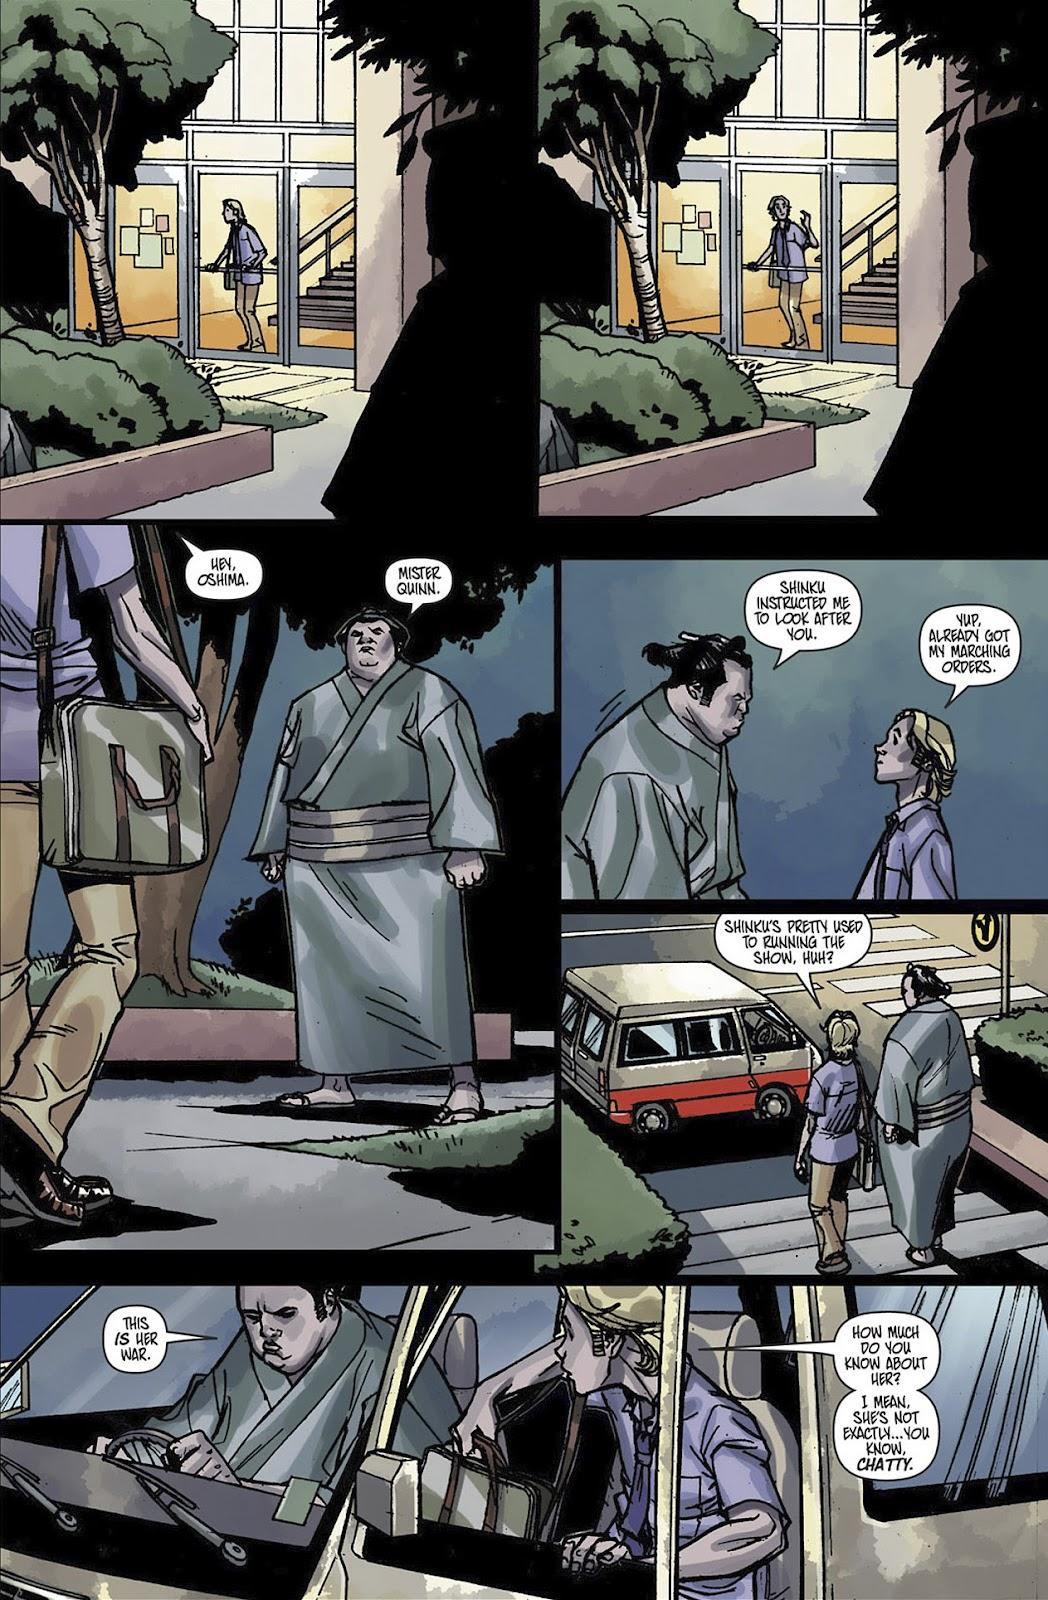 Read online Shinku comic -  Issue #3 - 15